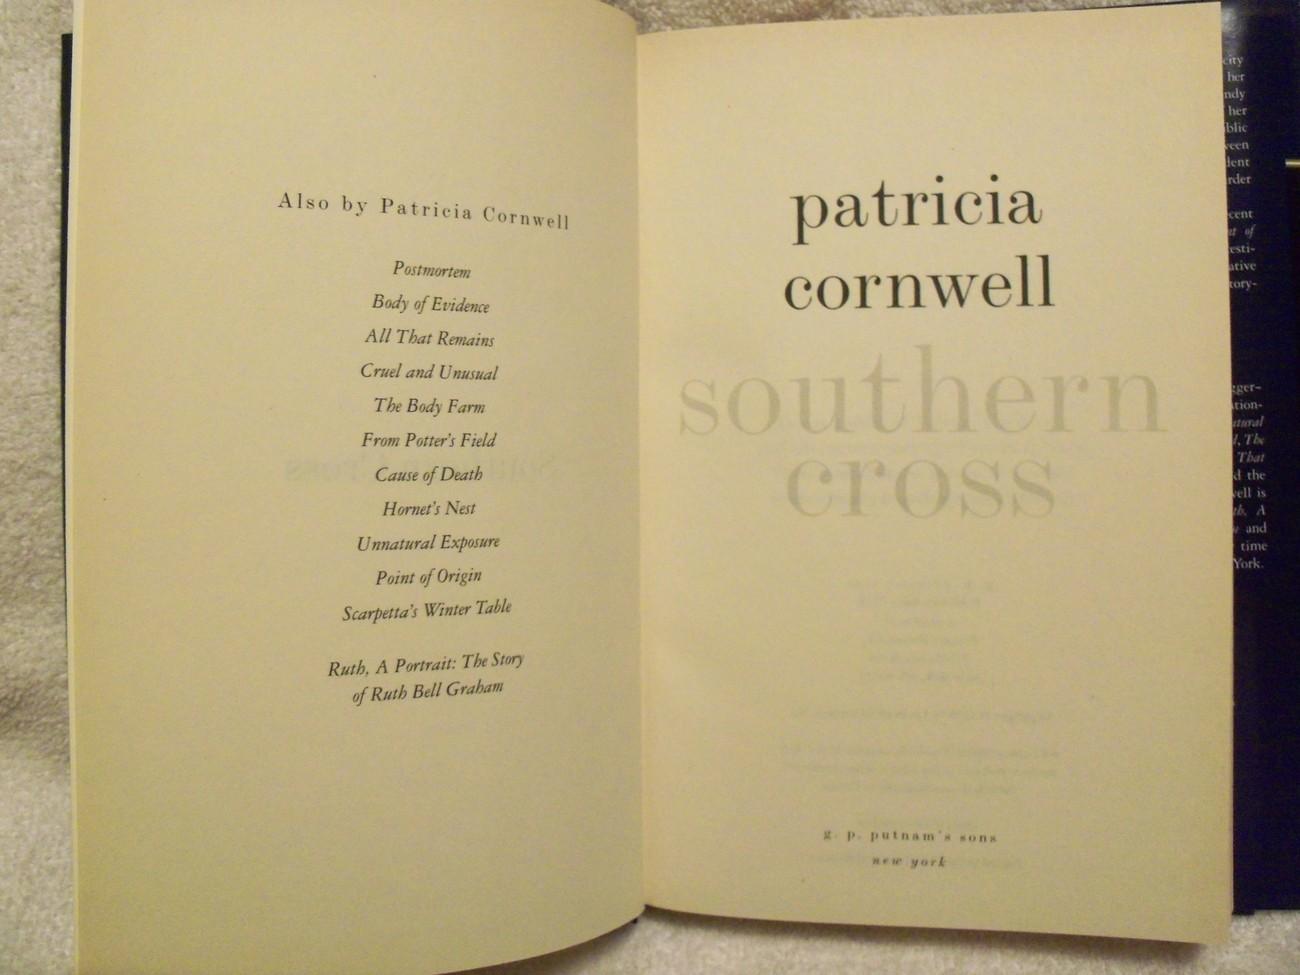 Southern Cross by Patricia Cornwell Judy HammerHB